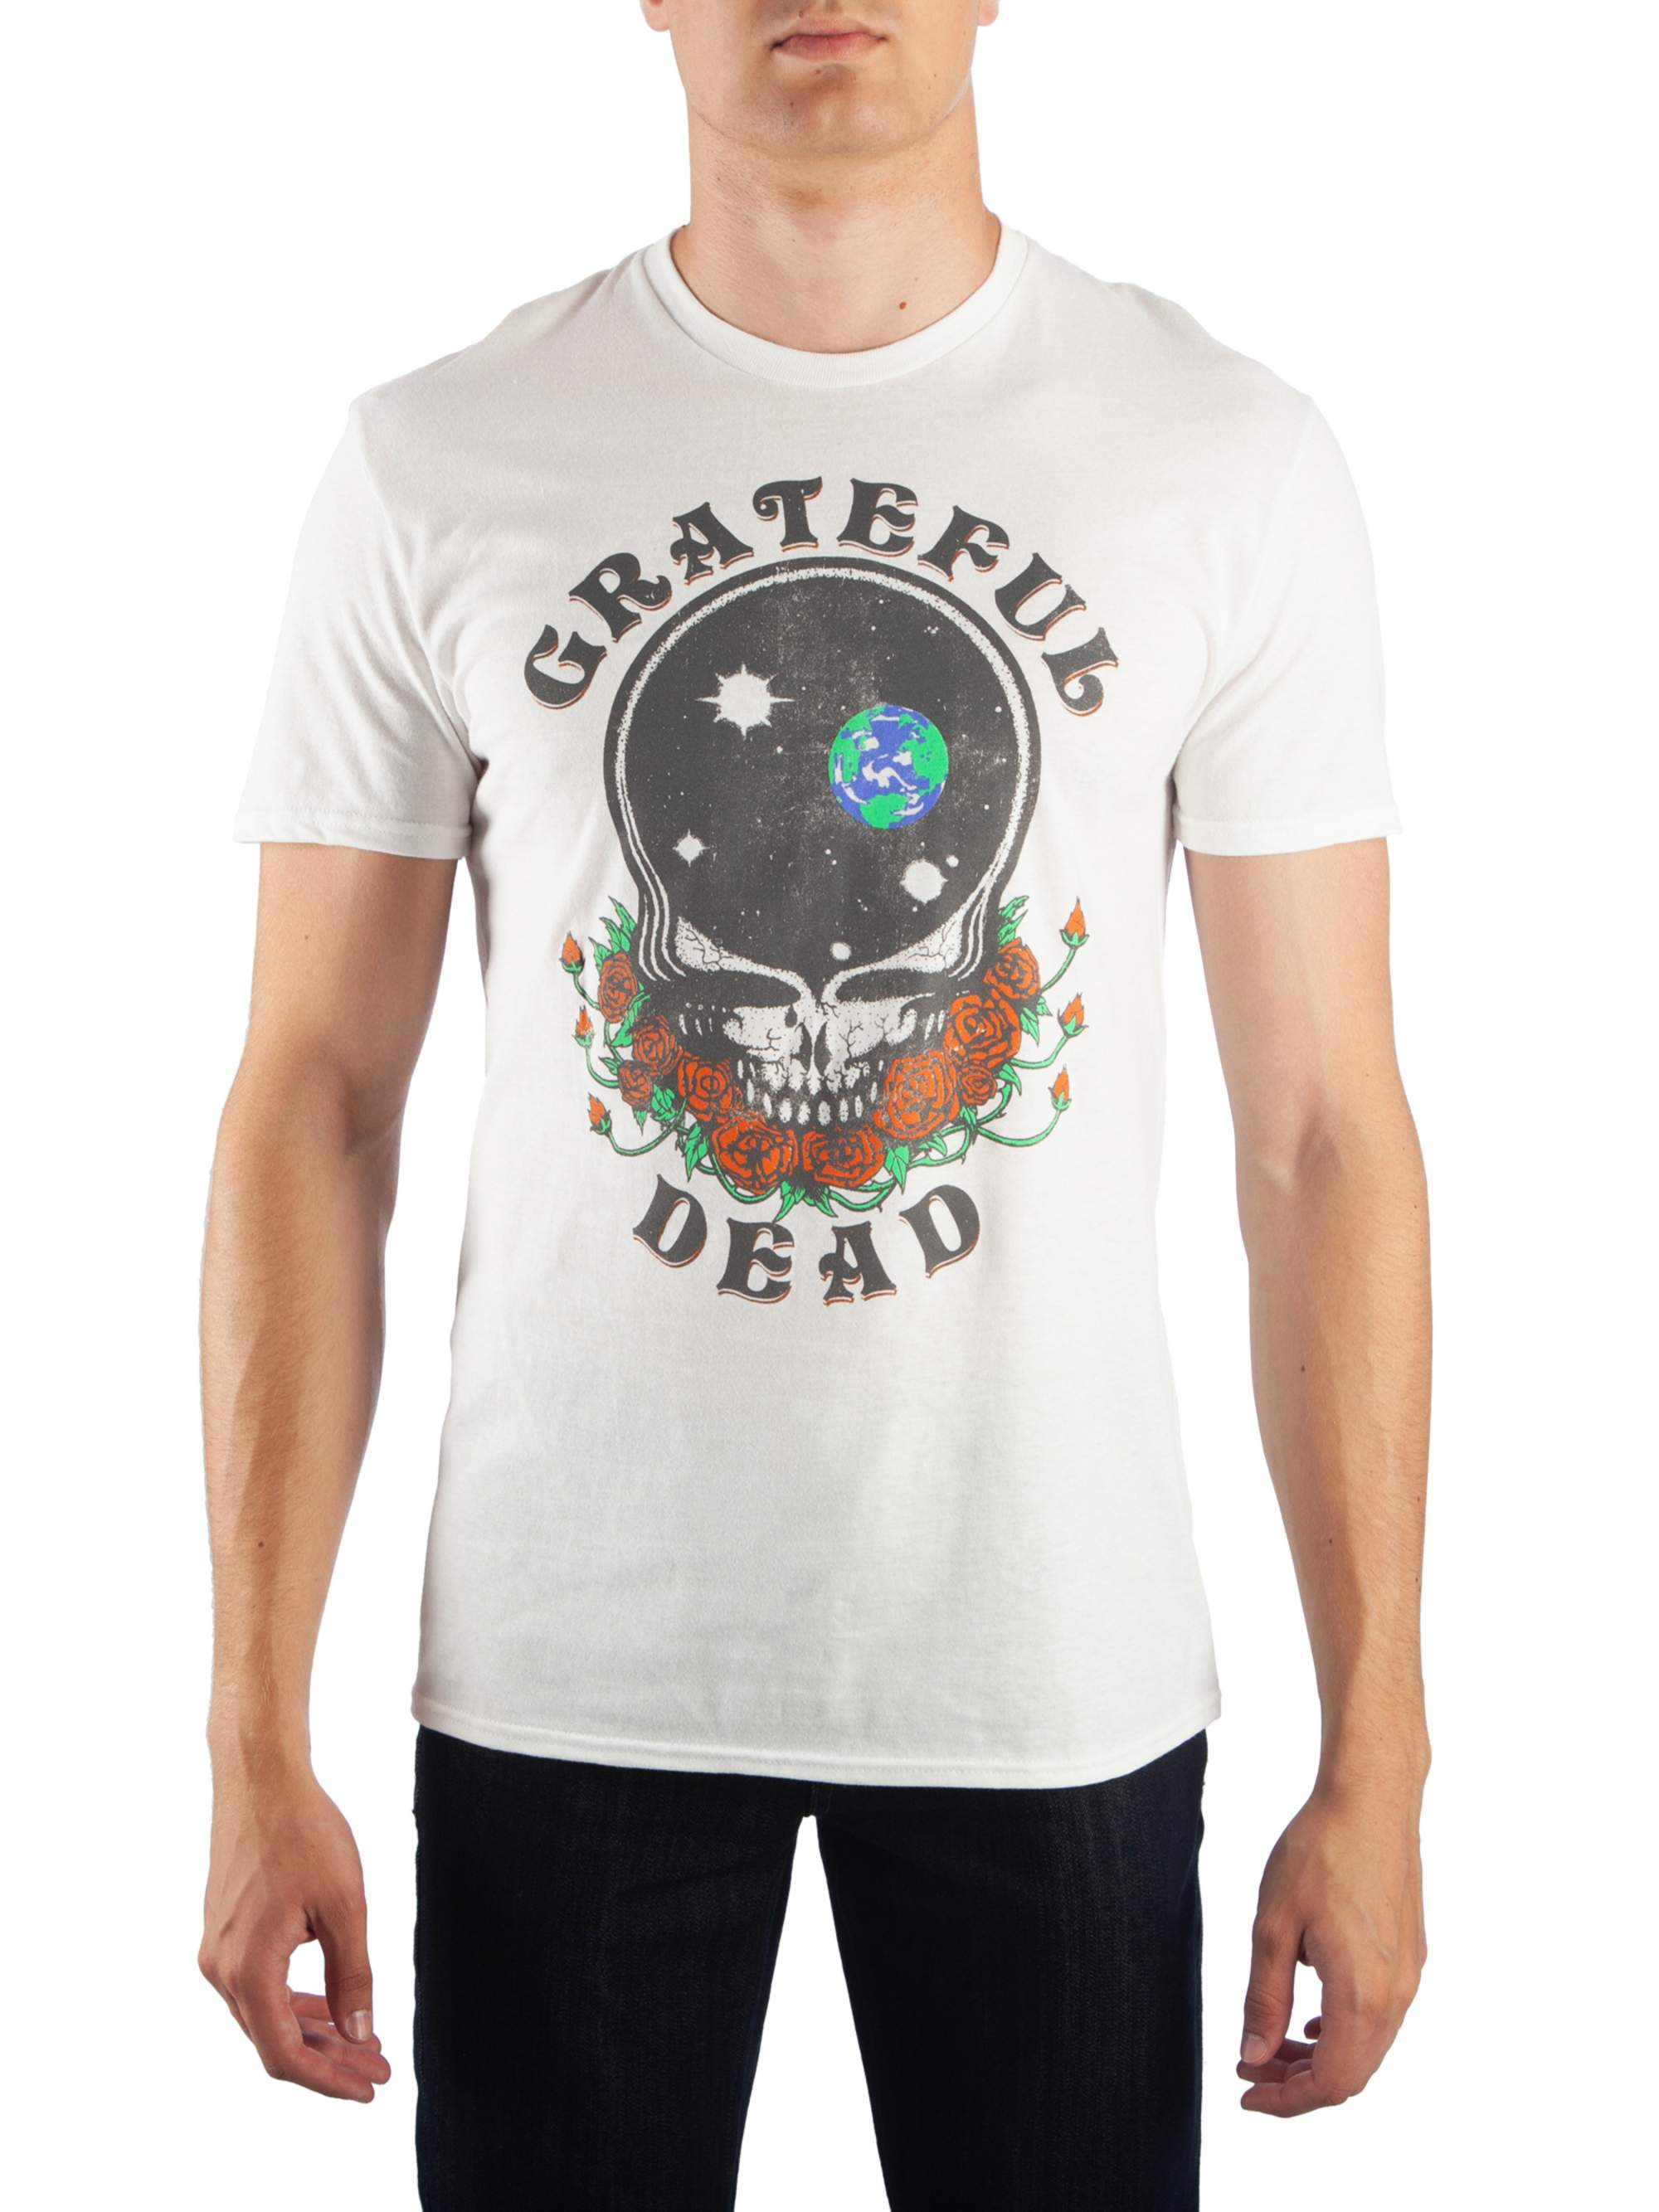 Men's Grateful Dead Space Your Face Graphic T-Shirt, Up To Size 2Xl